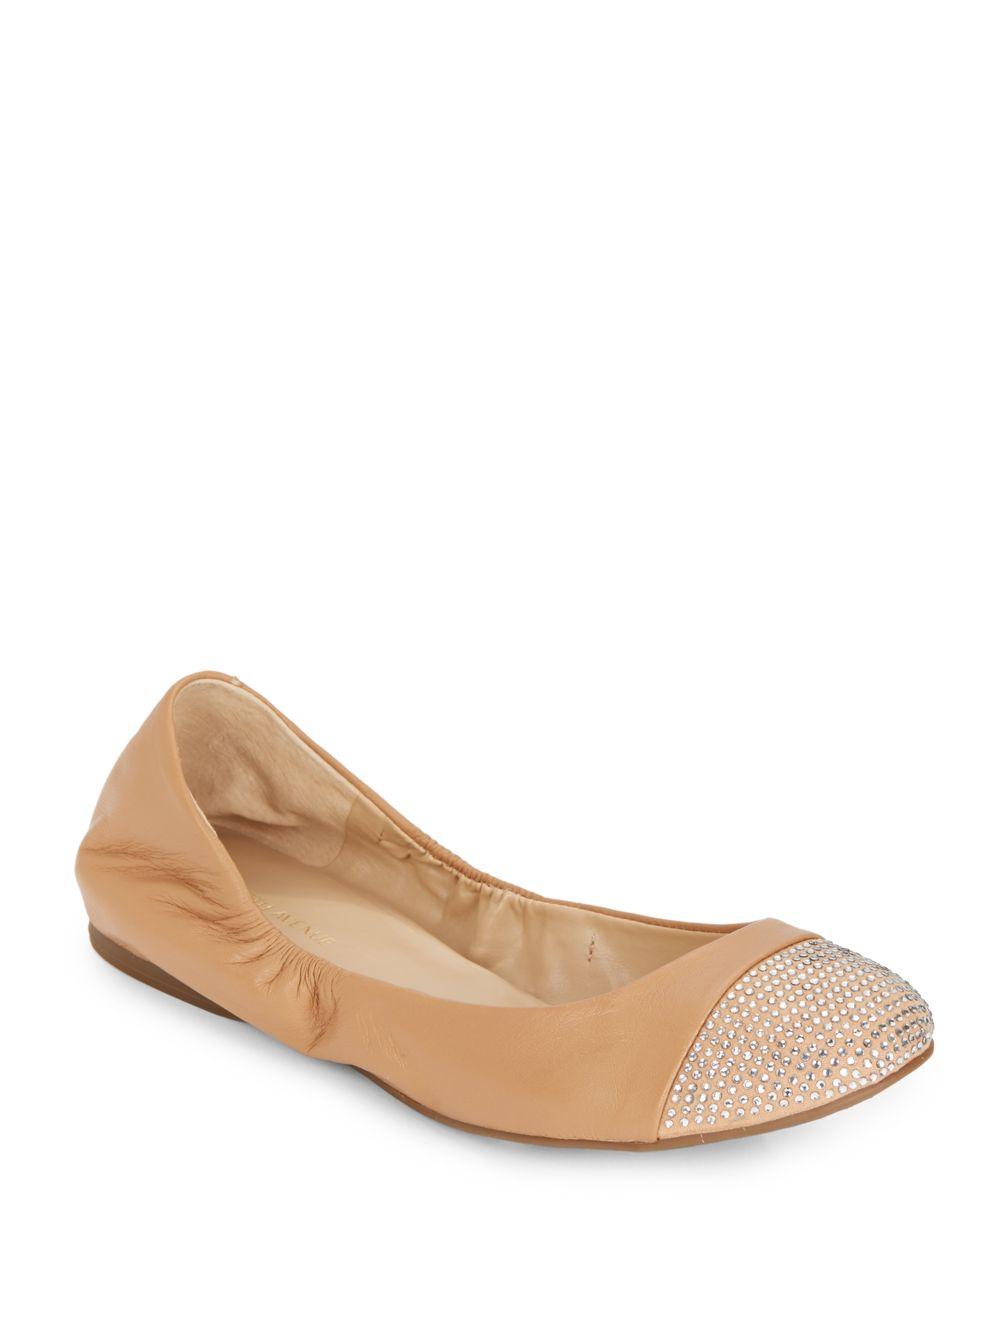 saks fifth avenue cacey embellished cap toe ballet flats